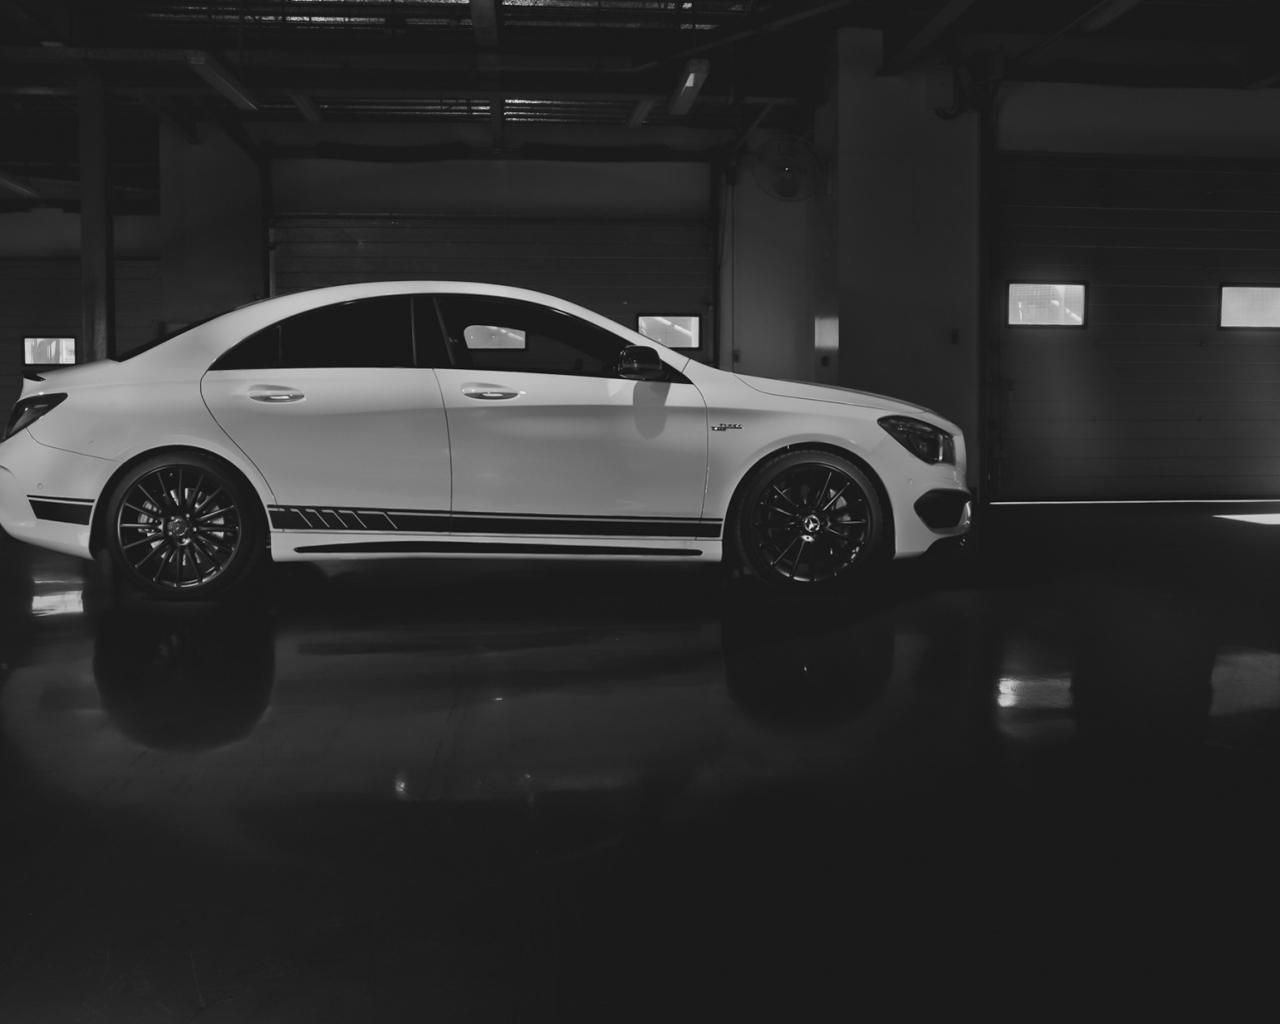 Free Download Mercedes Benz Cla 45 Amg Crankandpistoncom